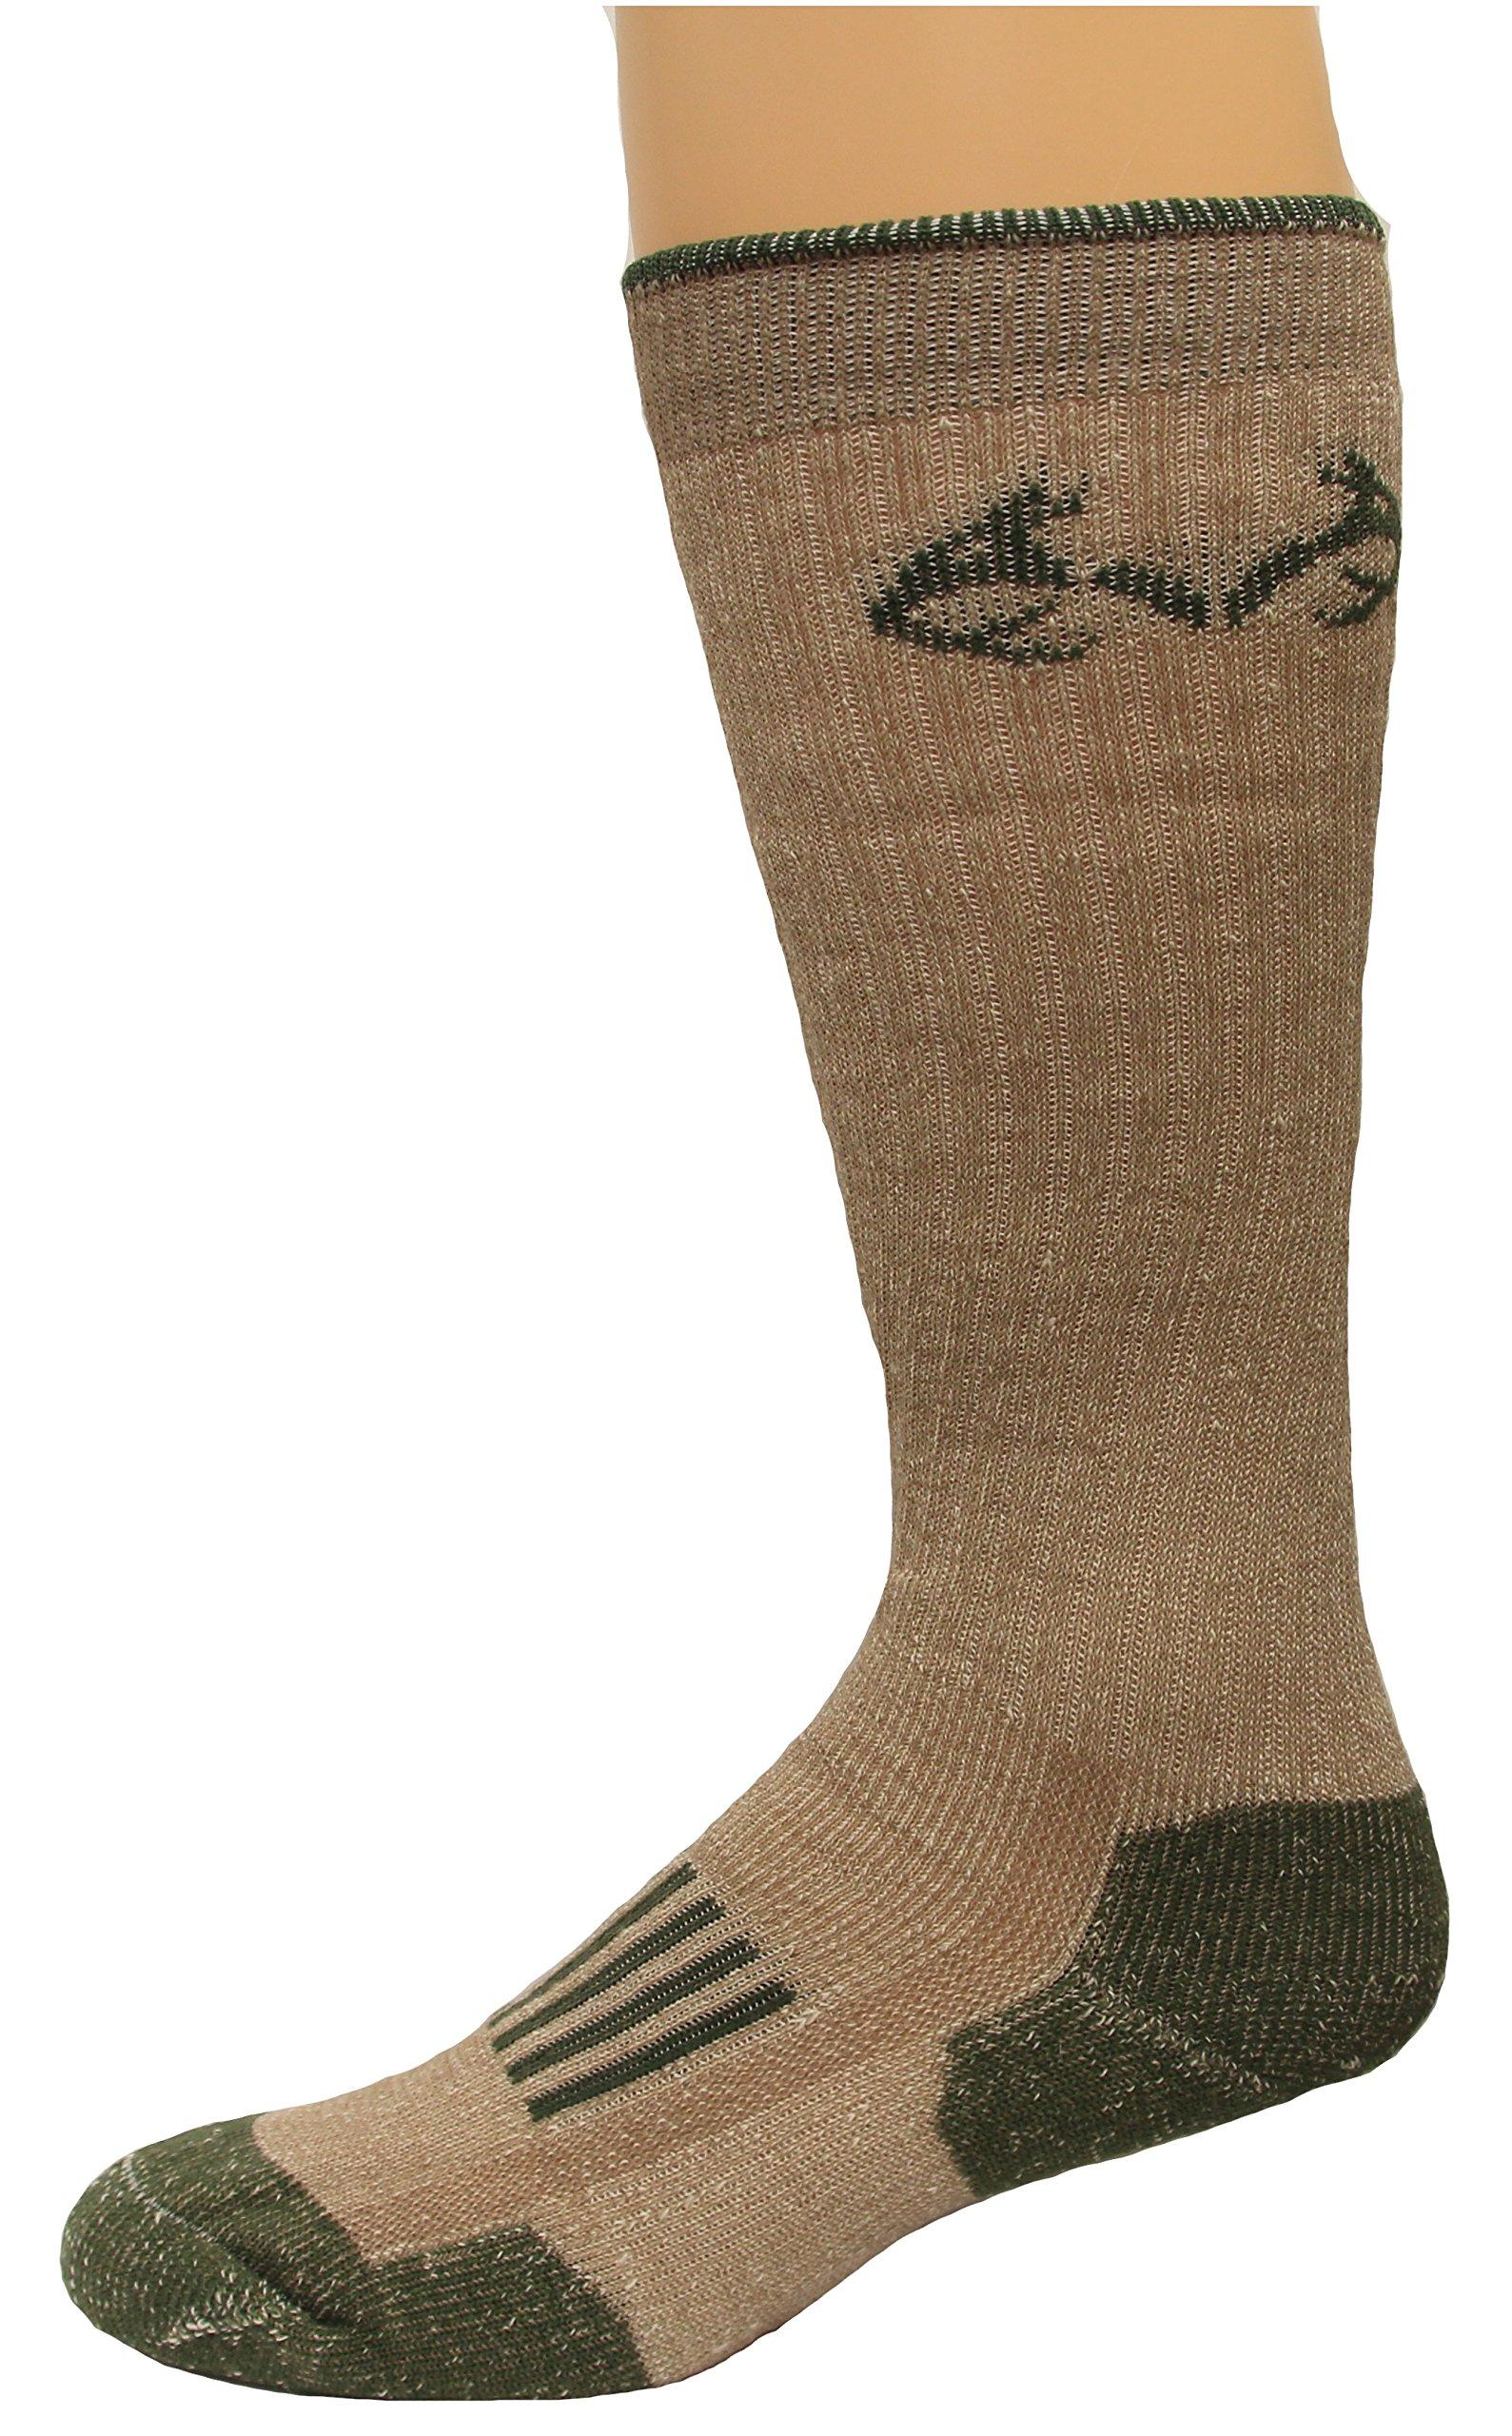 Realtree Men's Merino Tall Boot Socks, Tan, X-Large